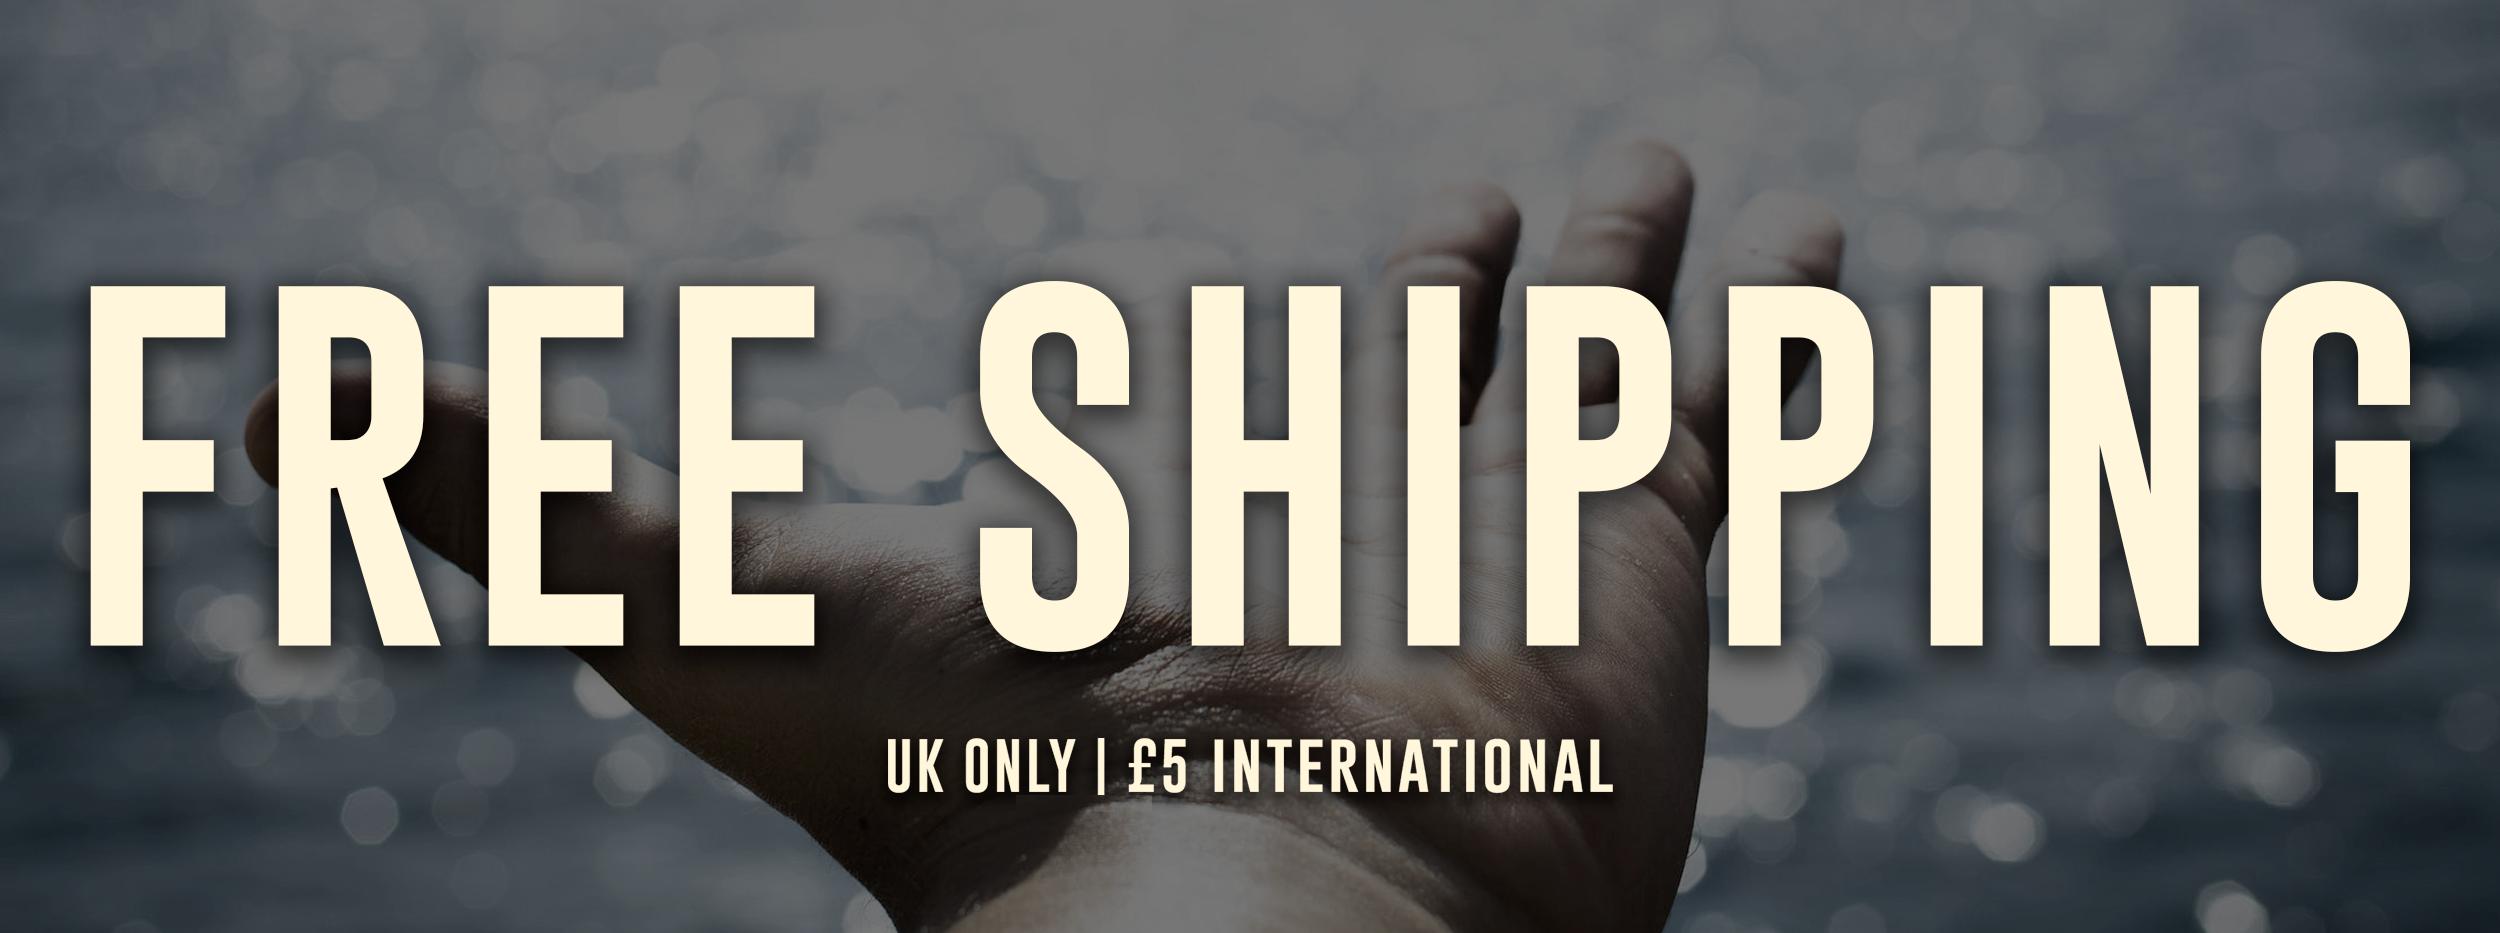 FREE-SHIP_WEB_BANNER_V2.png